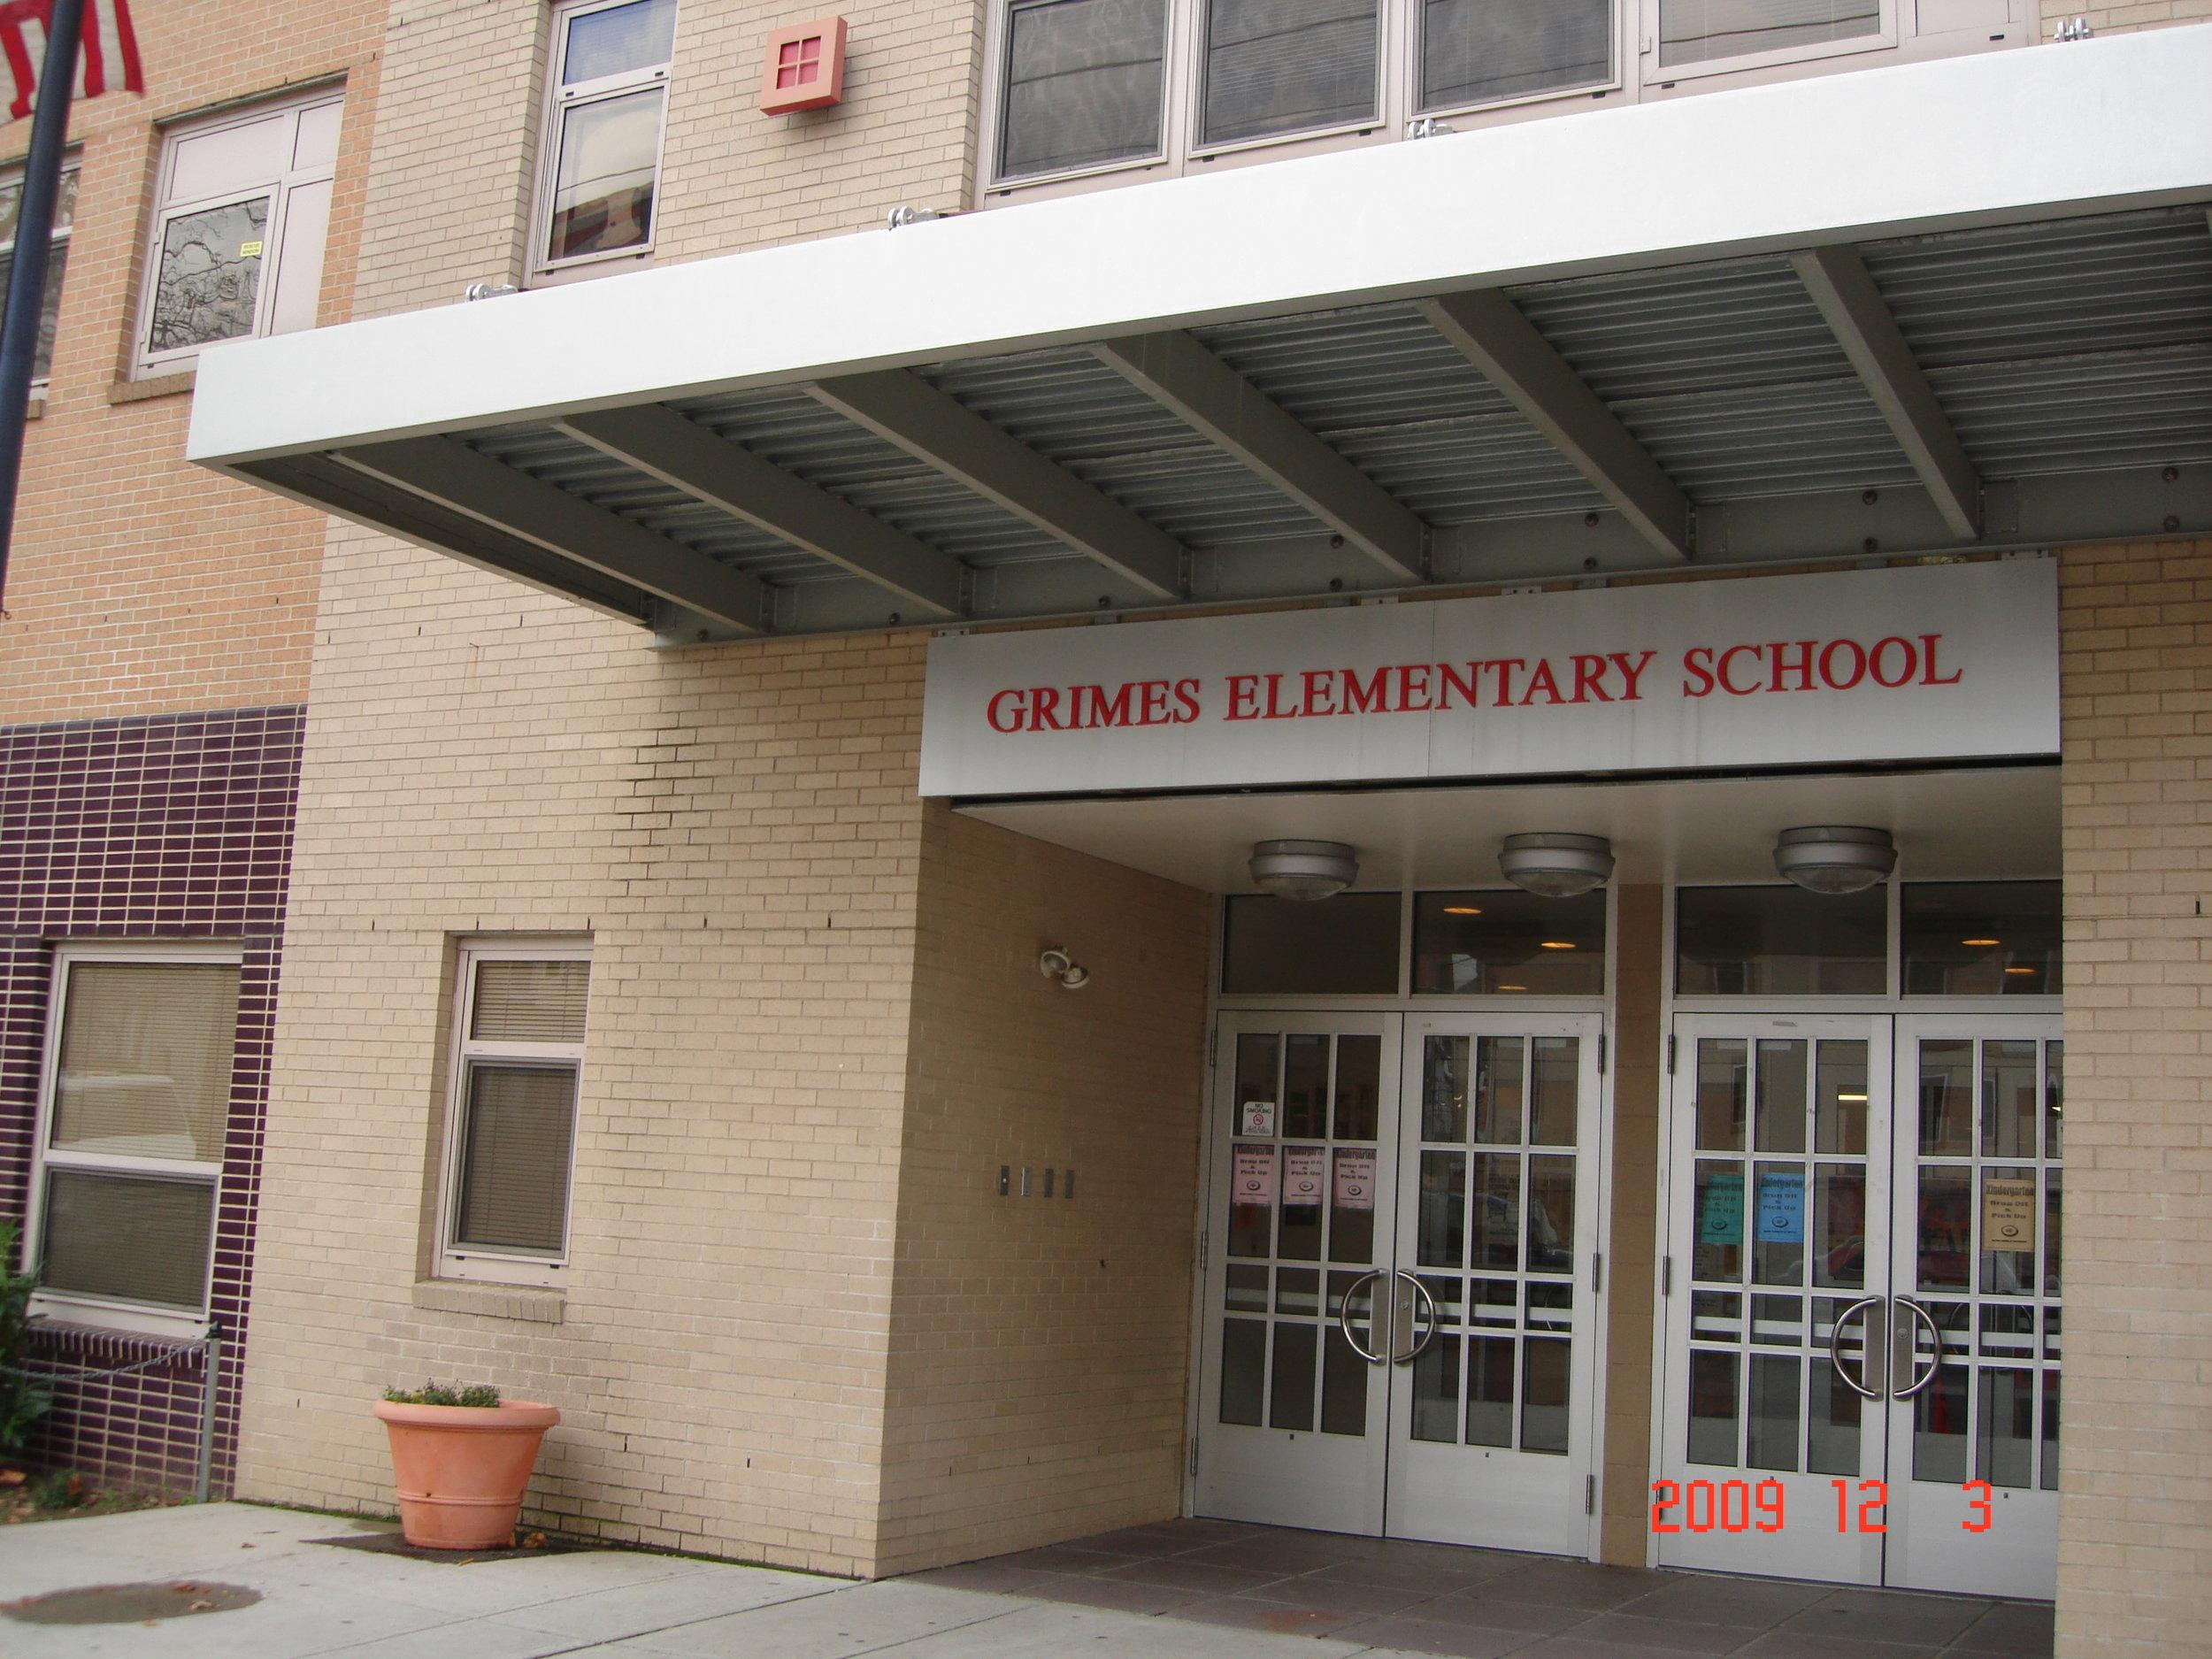 grimes elementary school.jpg